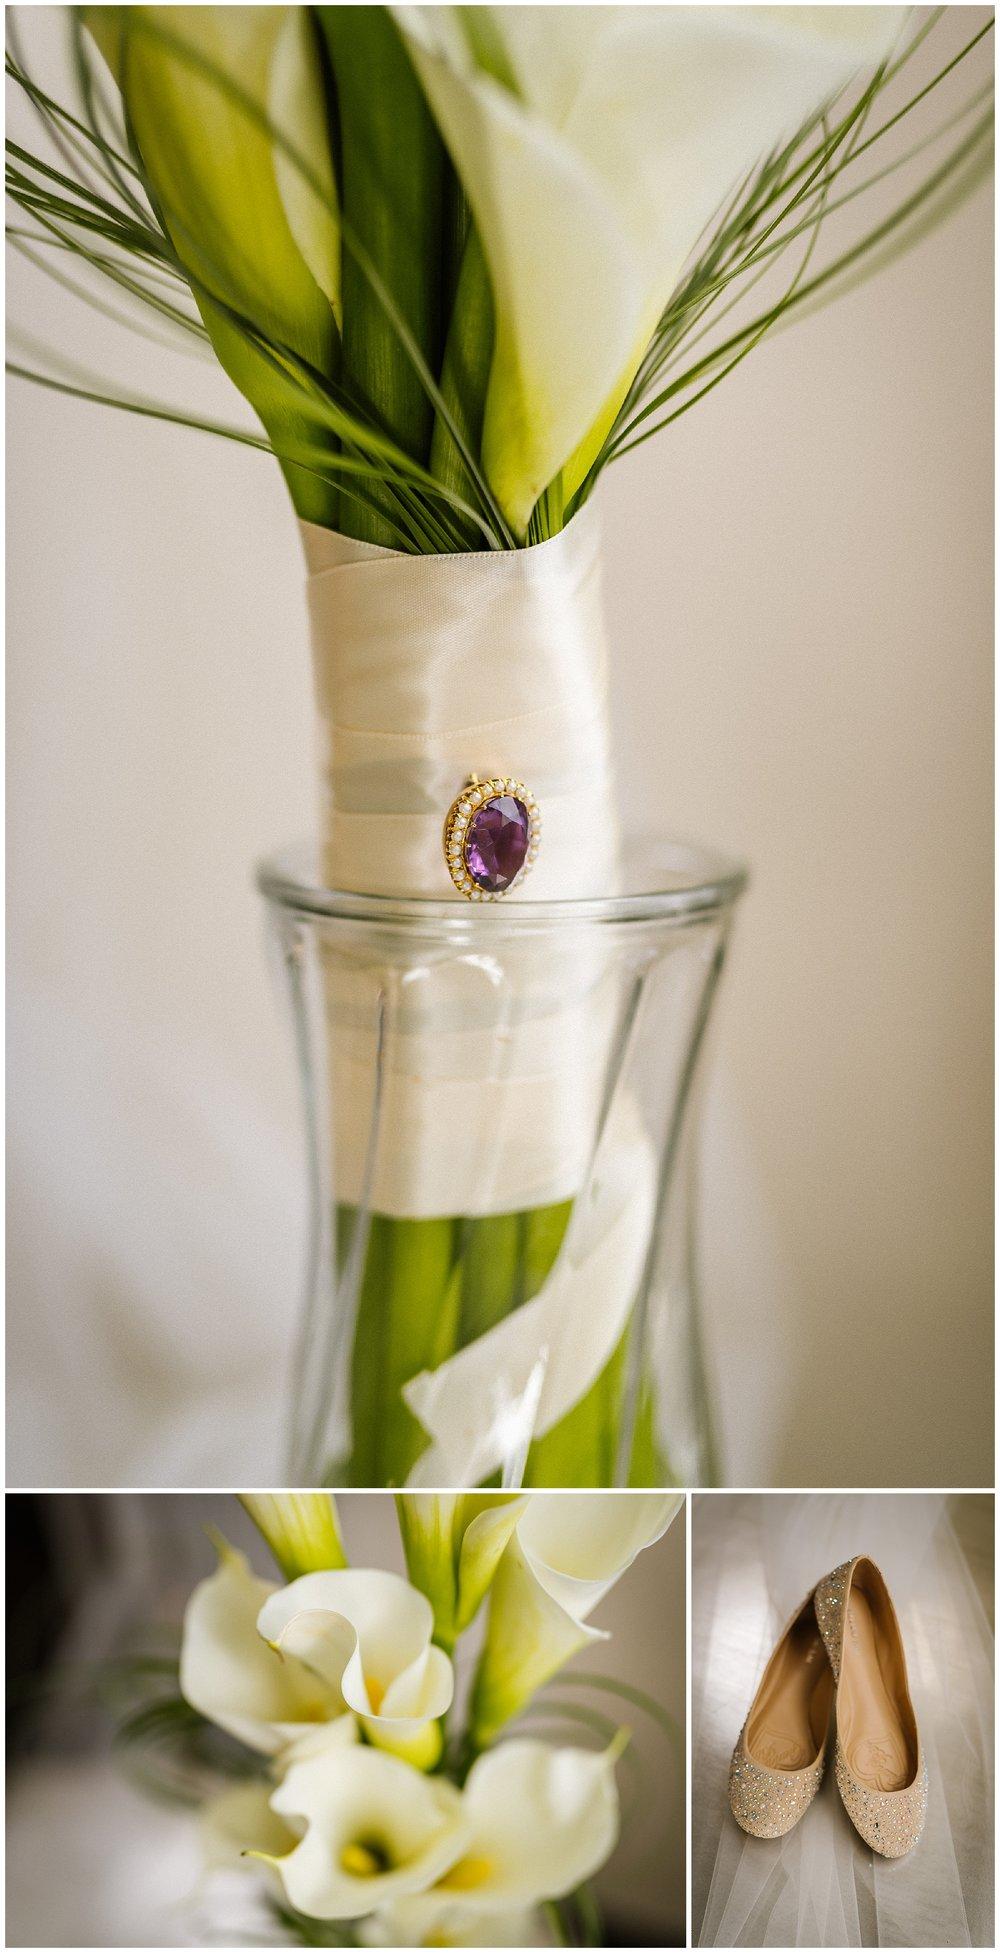 St-pete-wedding-photography-unique-glass-blowing-gallery-succulent-art_0003.jpg